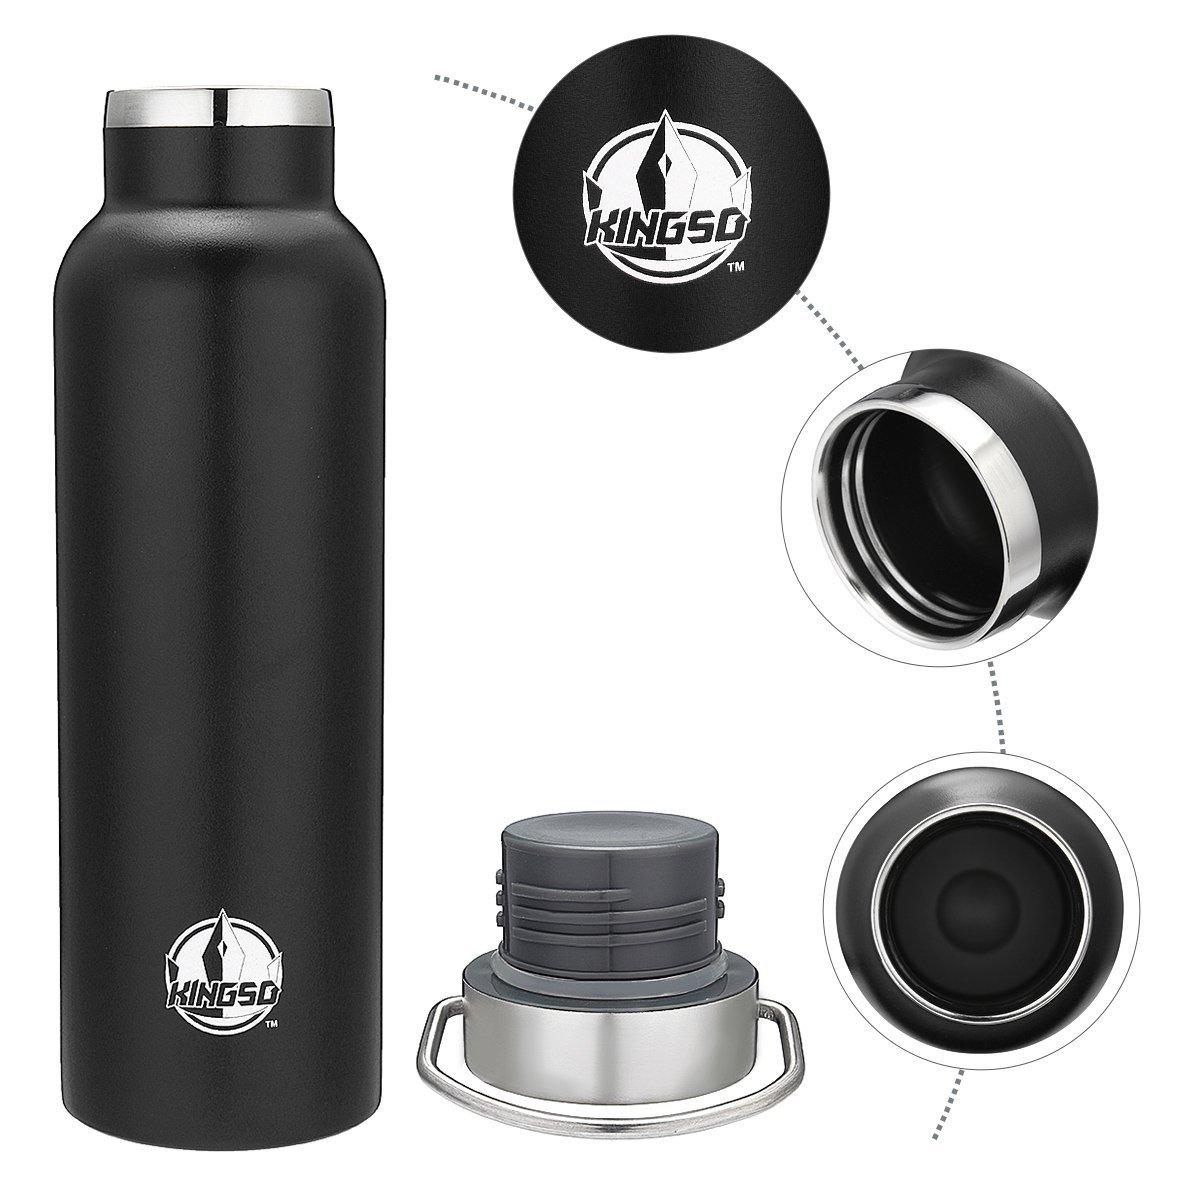 KINGSO 20oz Stainless Steel Sports Water Bottle Travel Mug $10.94